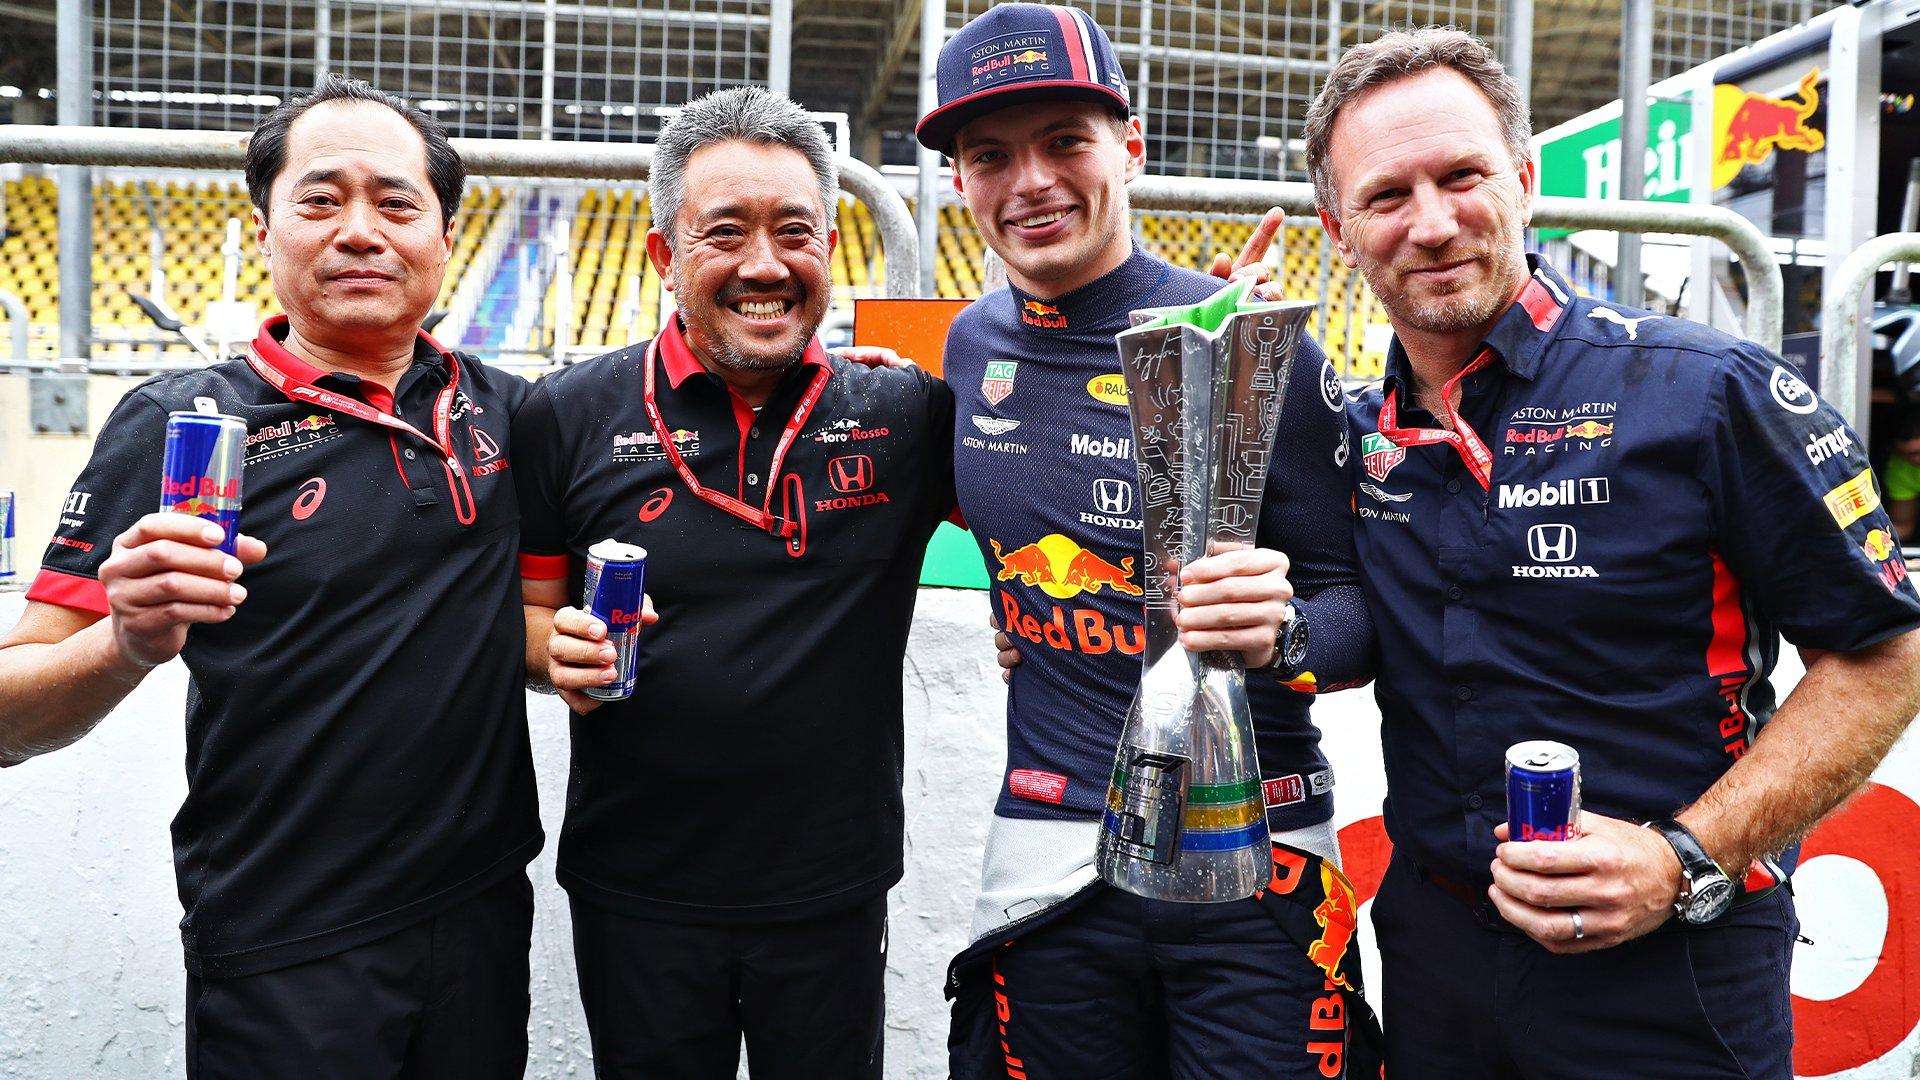 Honda quittera la F1 fin 2021